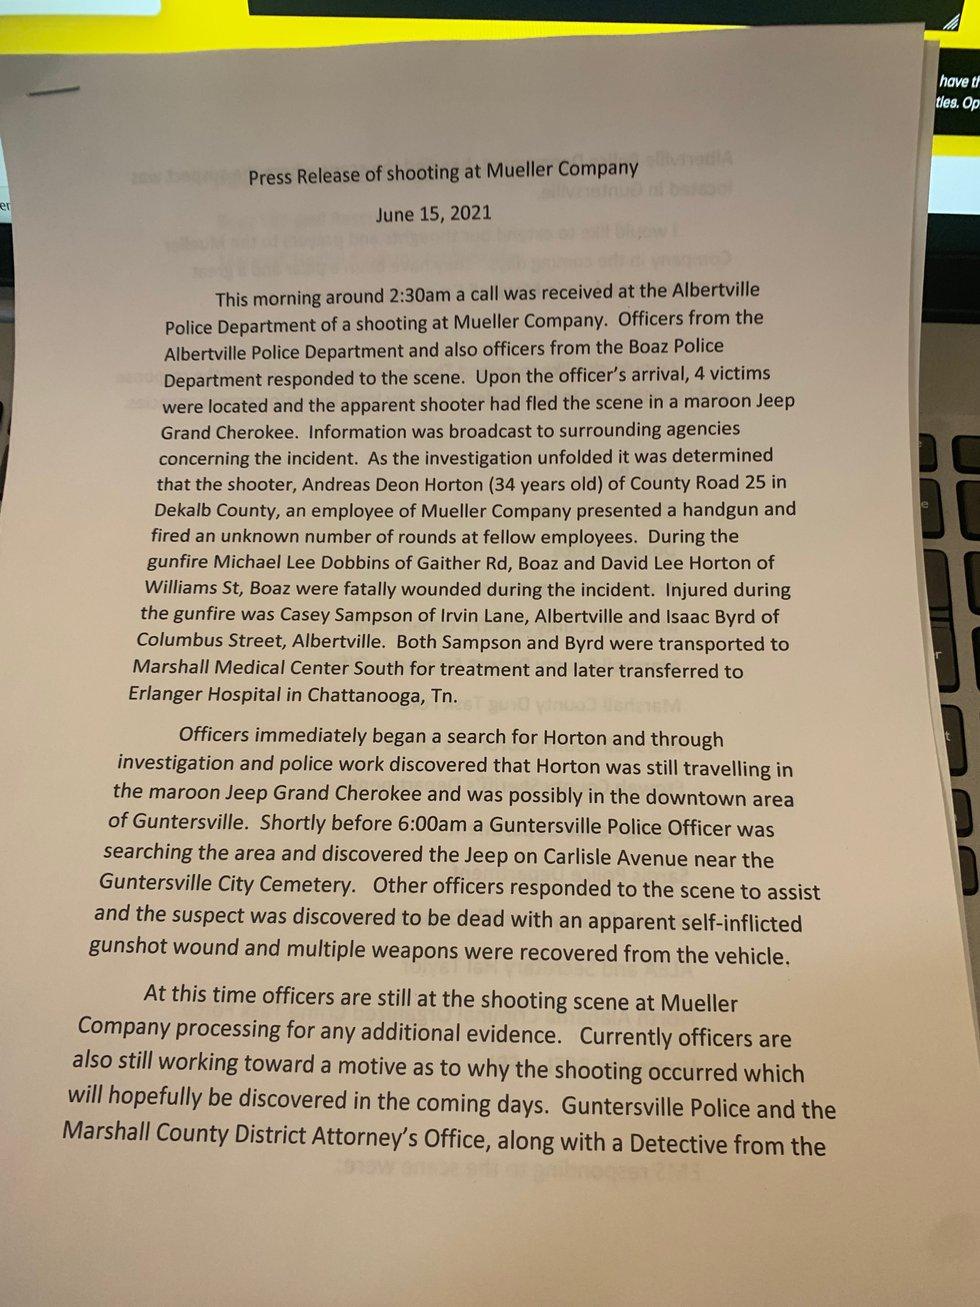 Prepared statement from Albertville Police Chief Jamie Smith